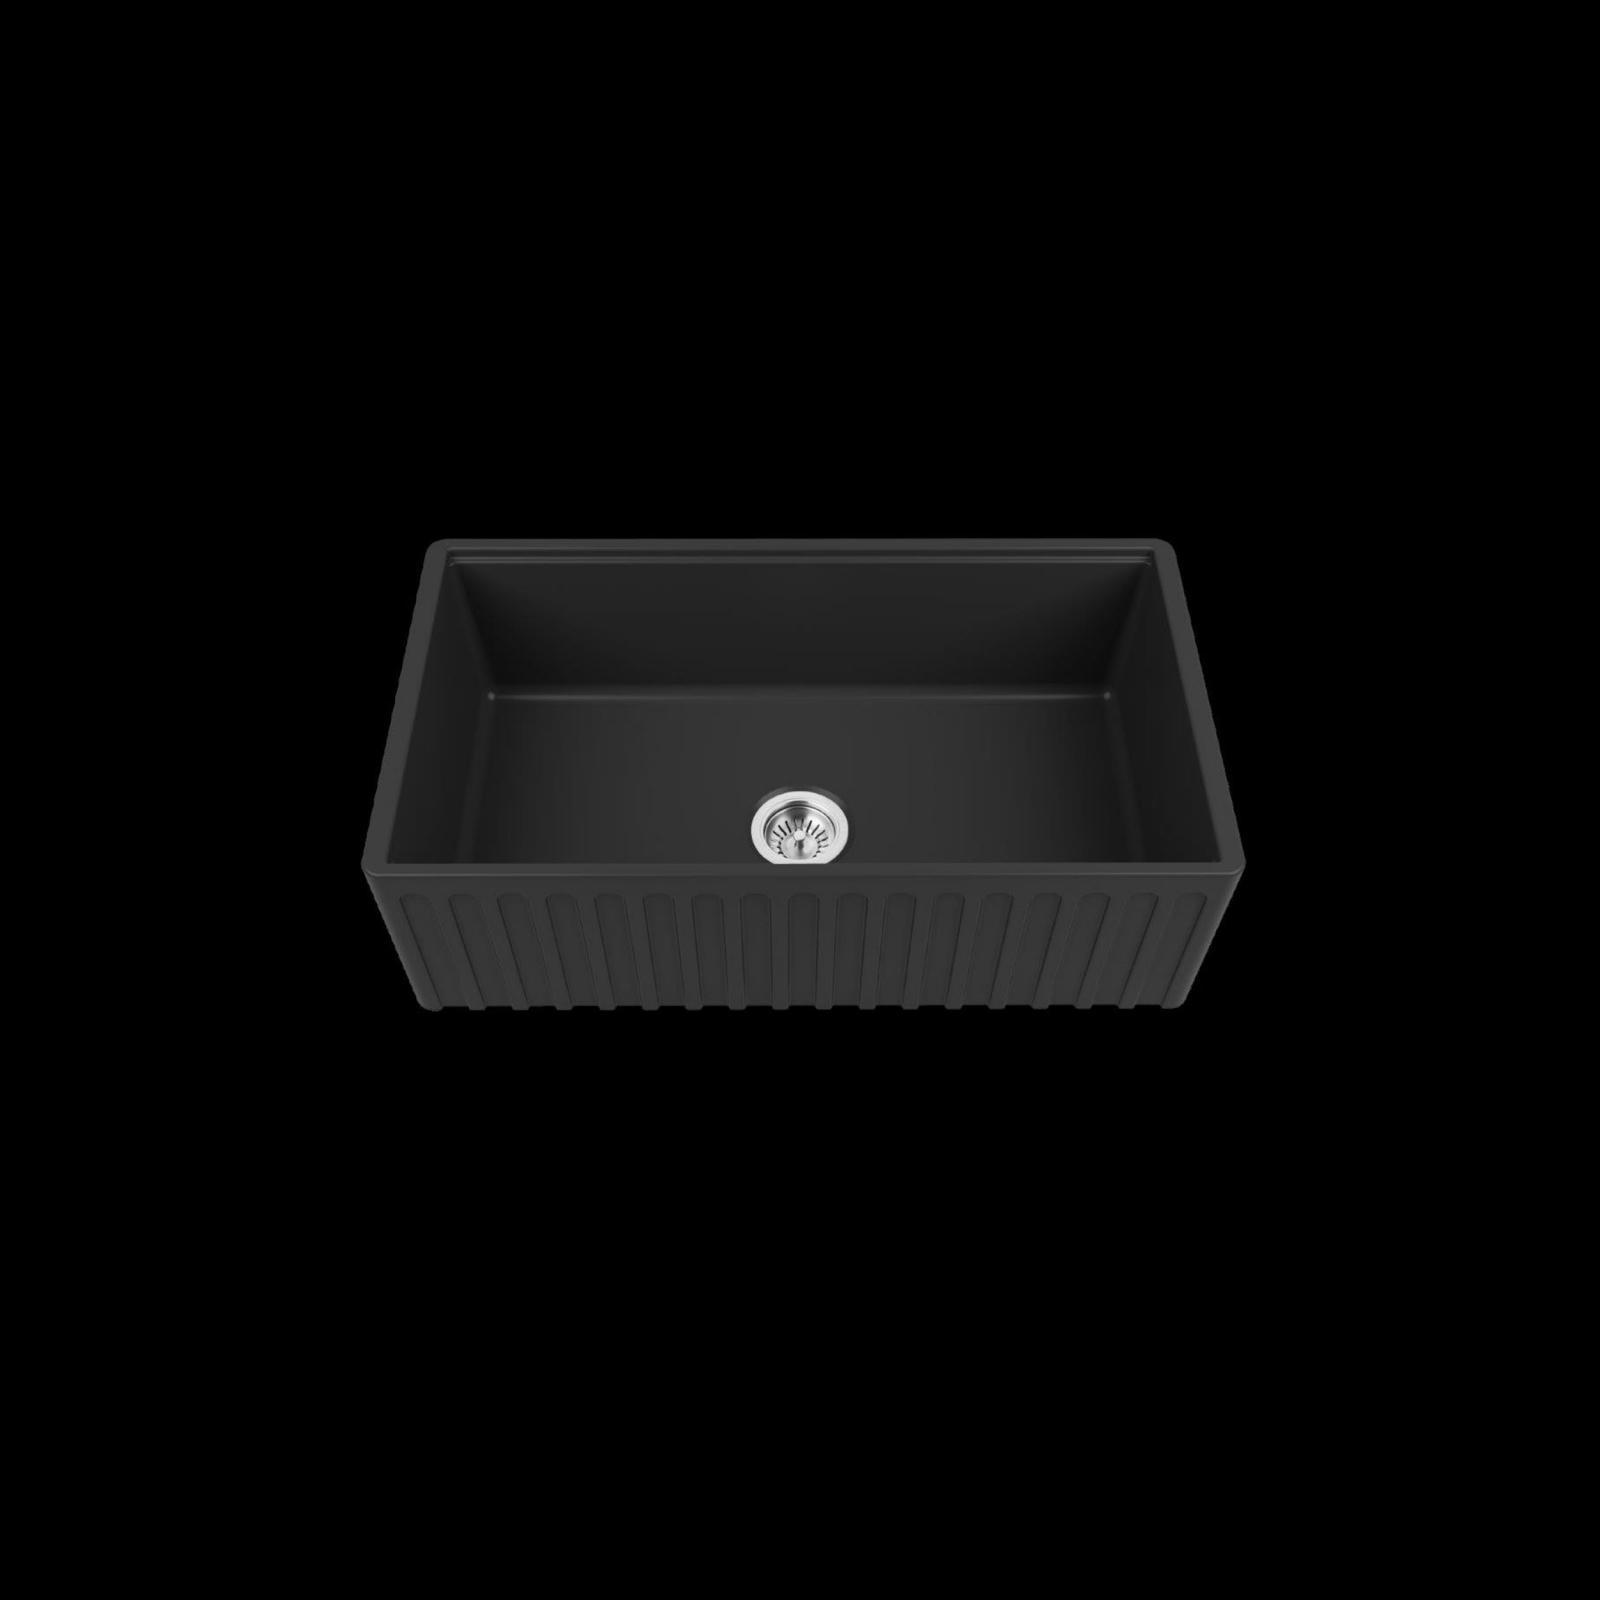 High-quality sink Louis Le Grand III black - single bowl, ceramic